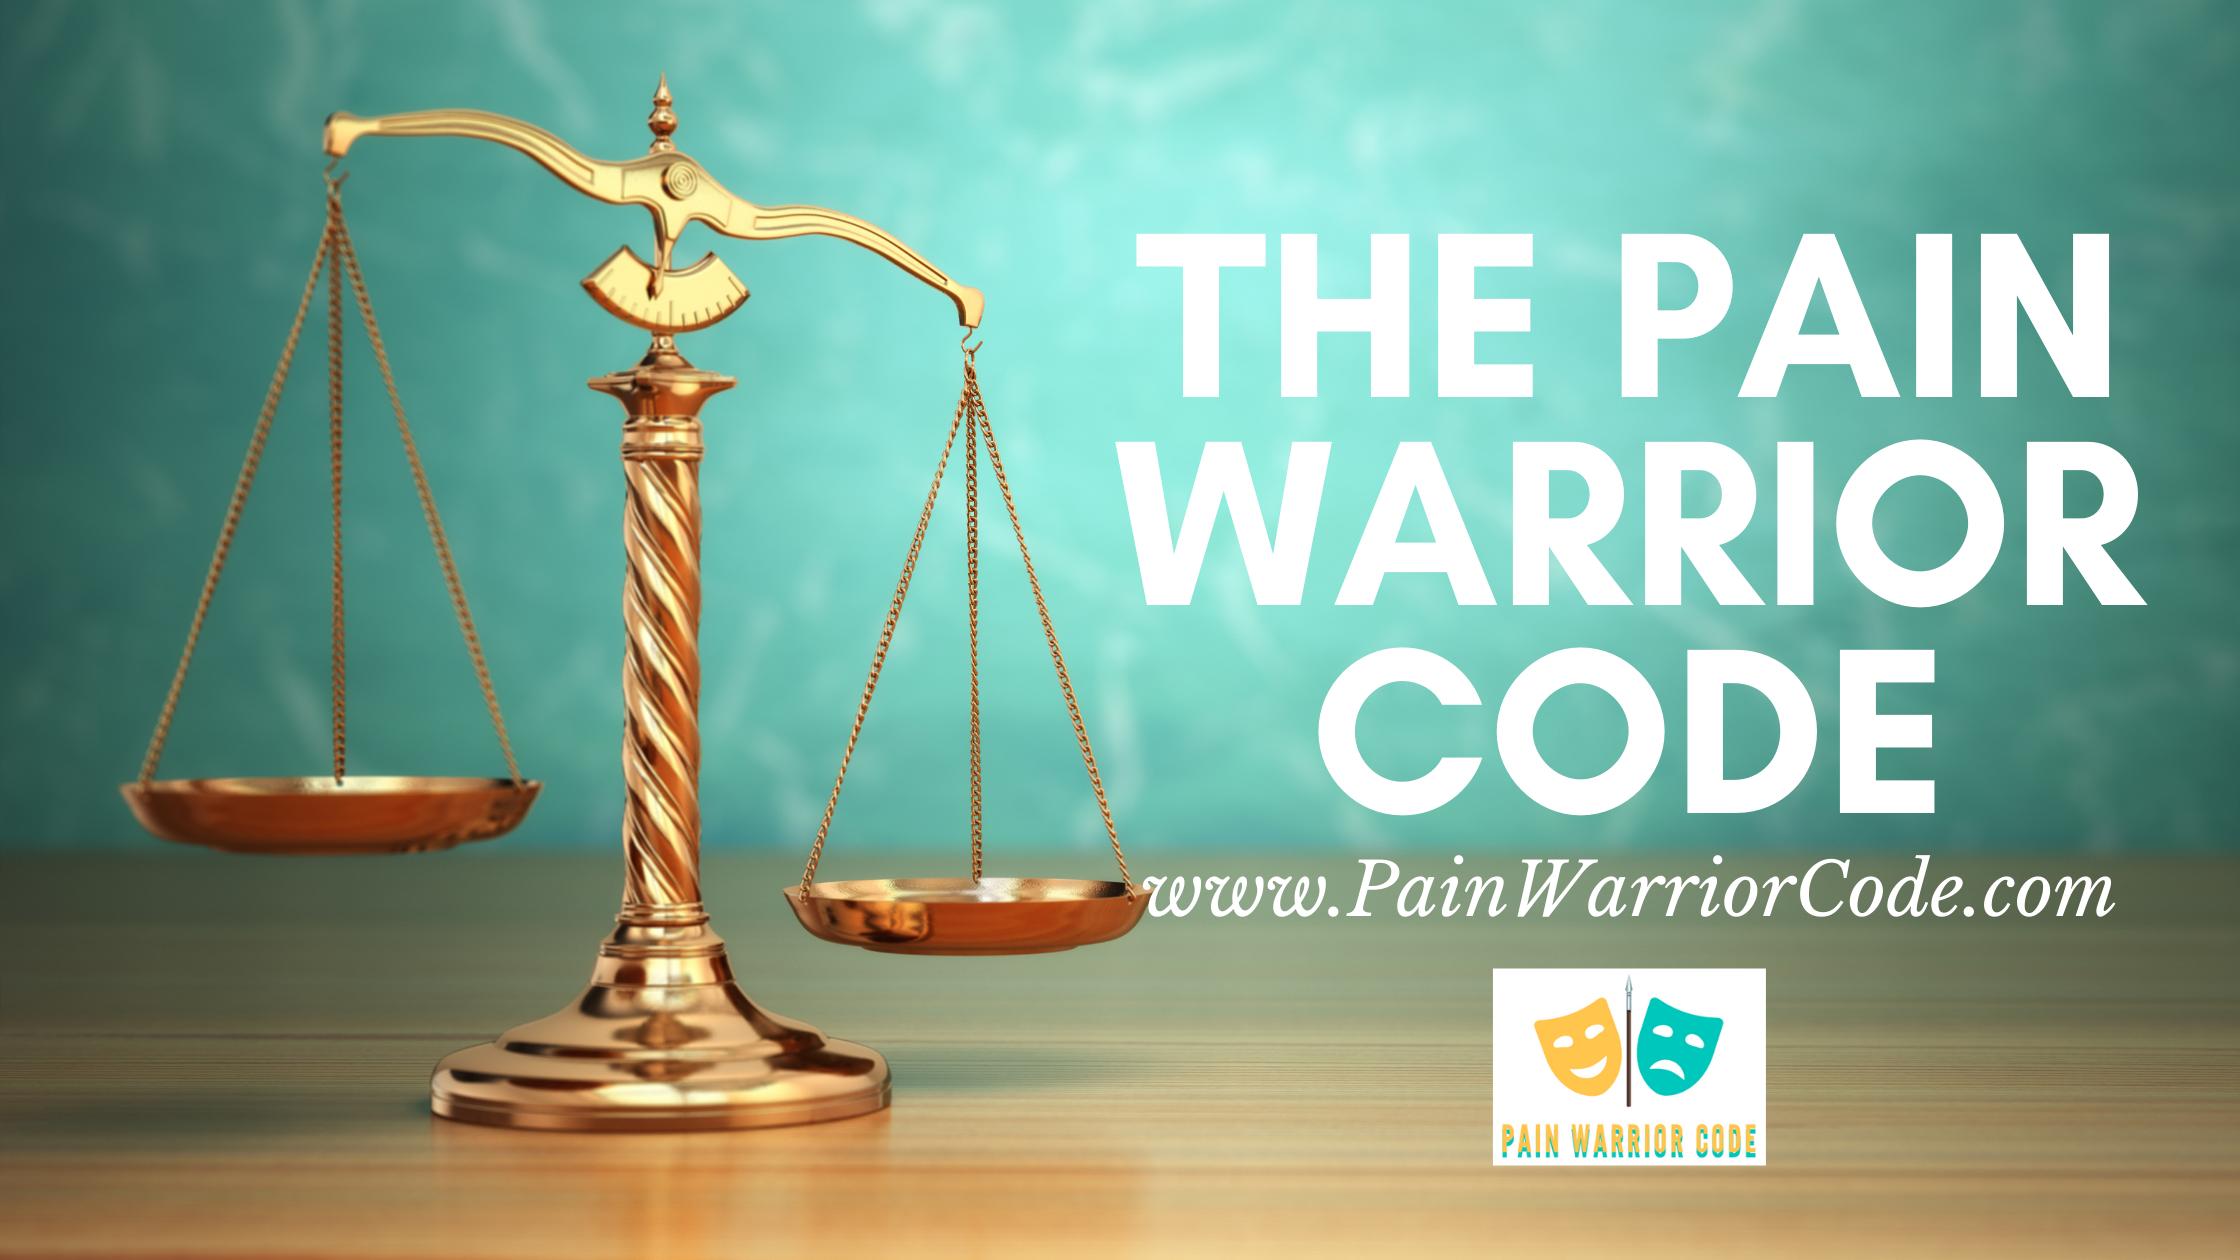 The pain warrior code